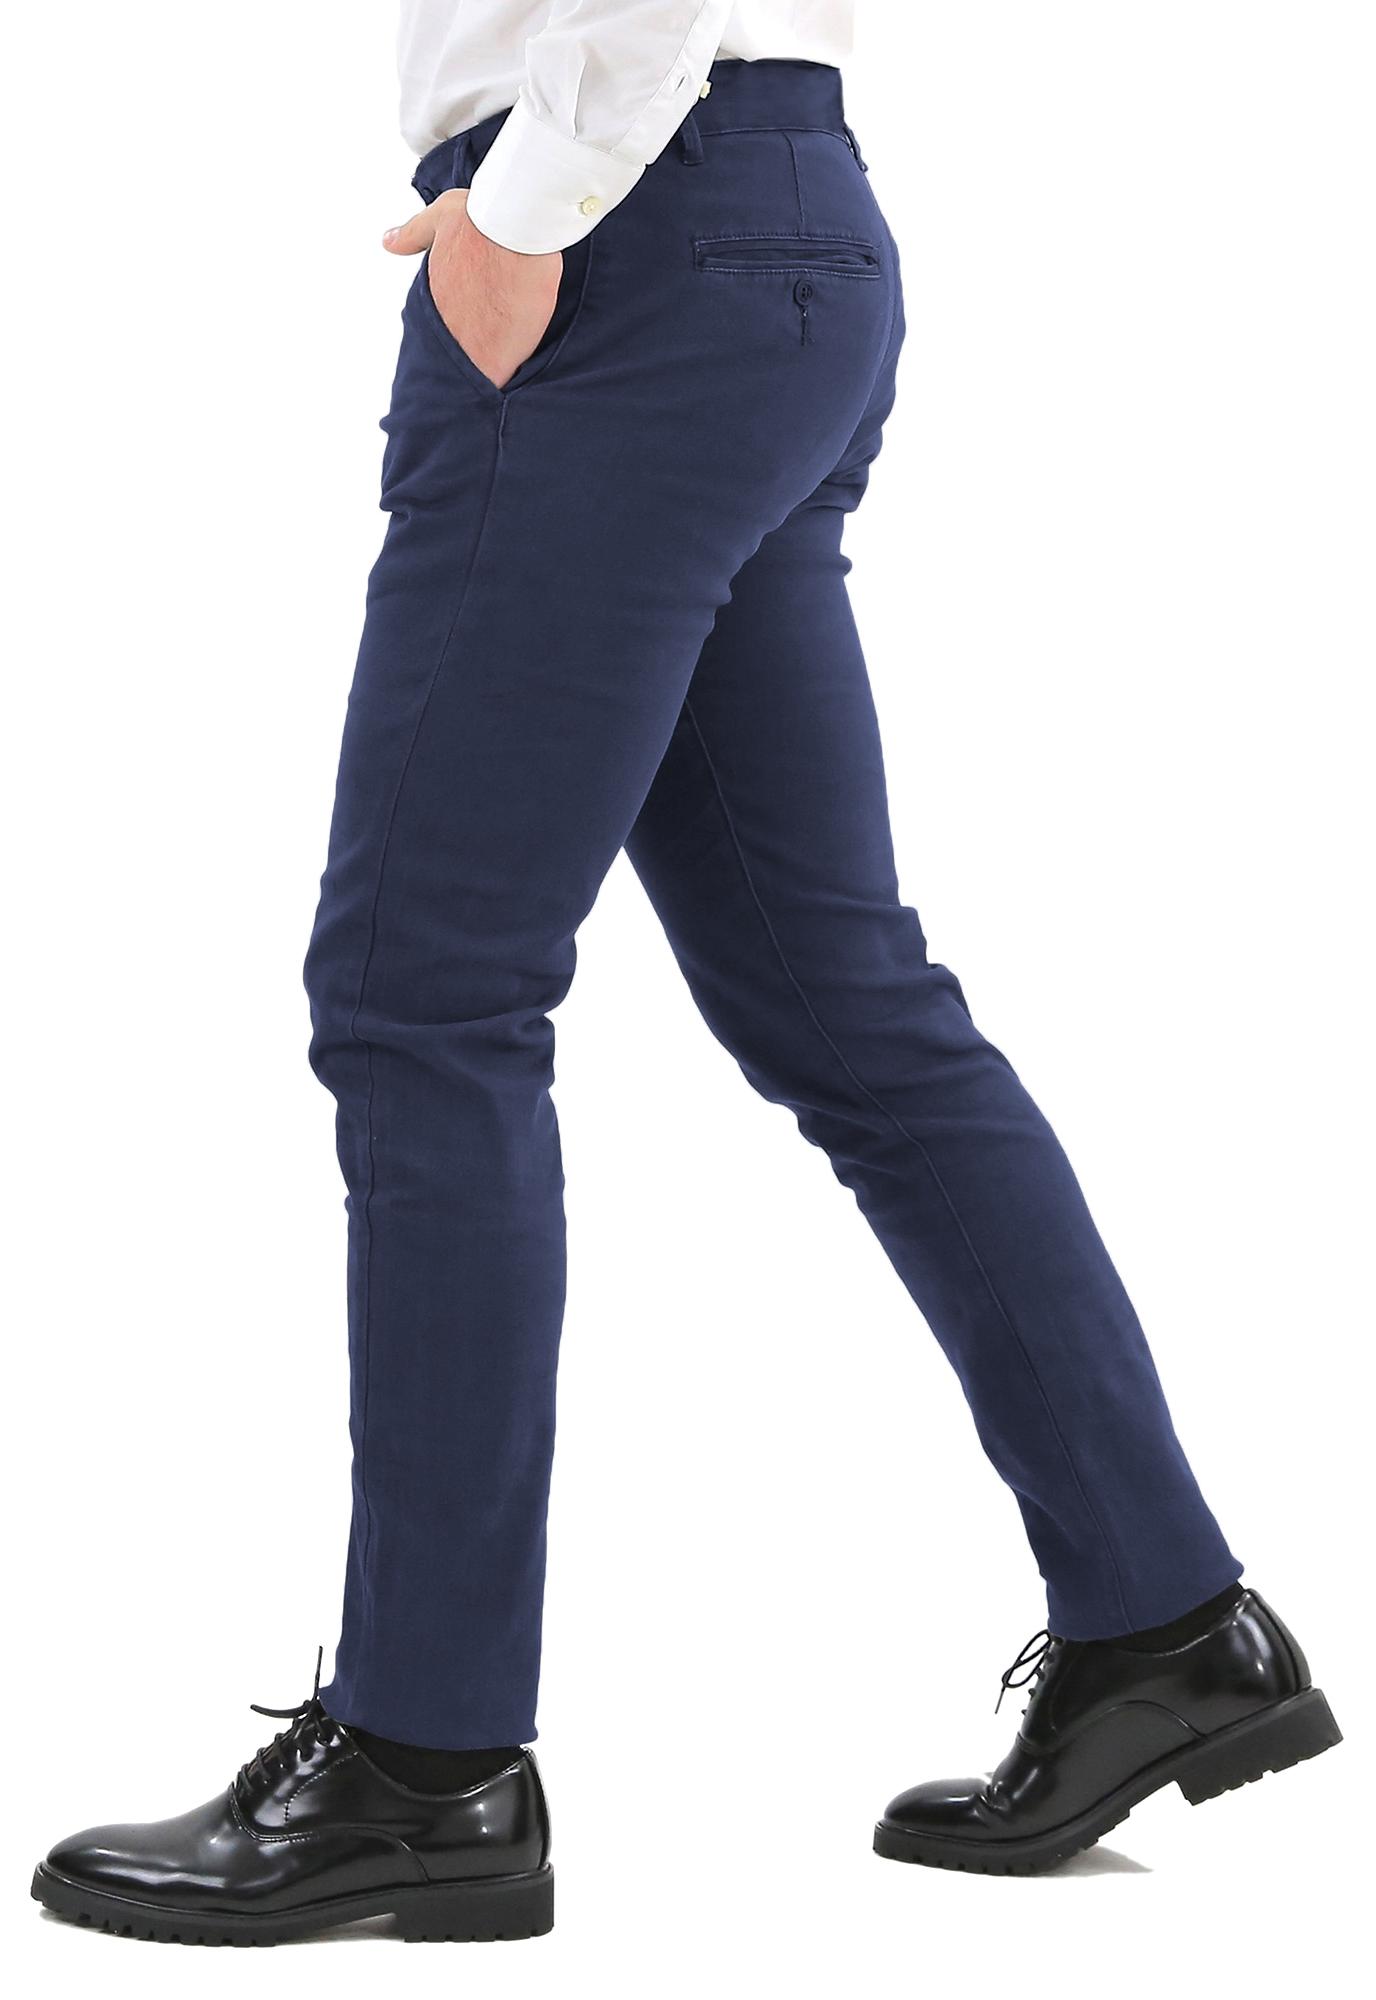 Pantaloni-Uomo-Slim-Fit-Eleganti-Invernali-Blu-Nero-Classico-Chino-Tasca-America miniatura 18